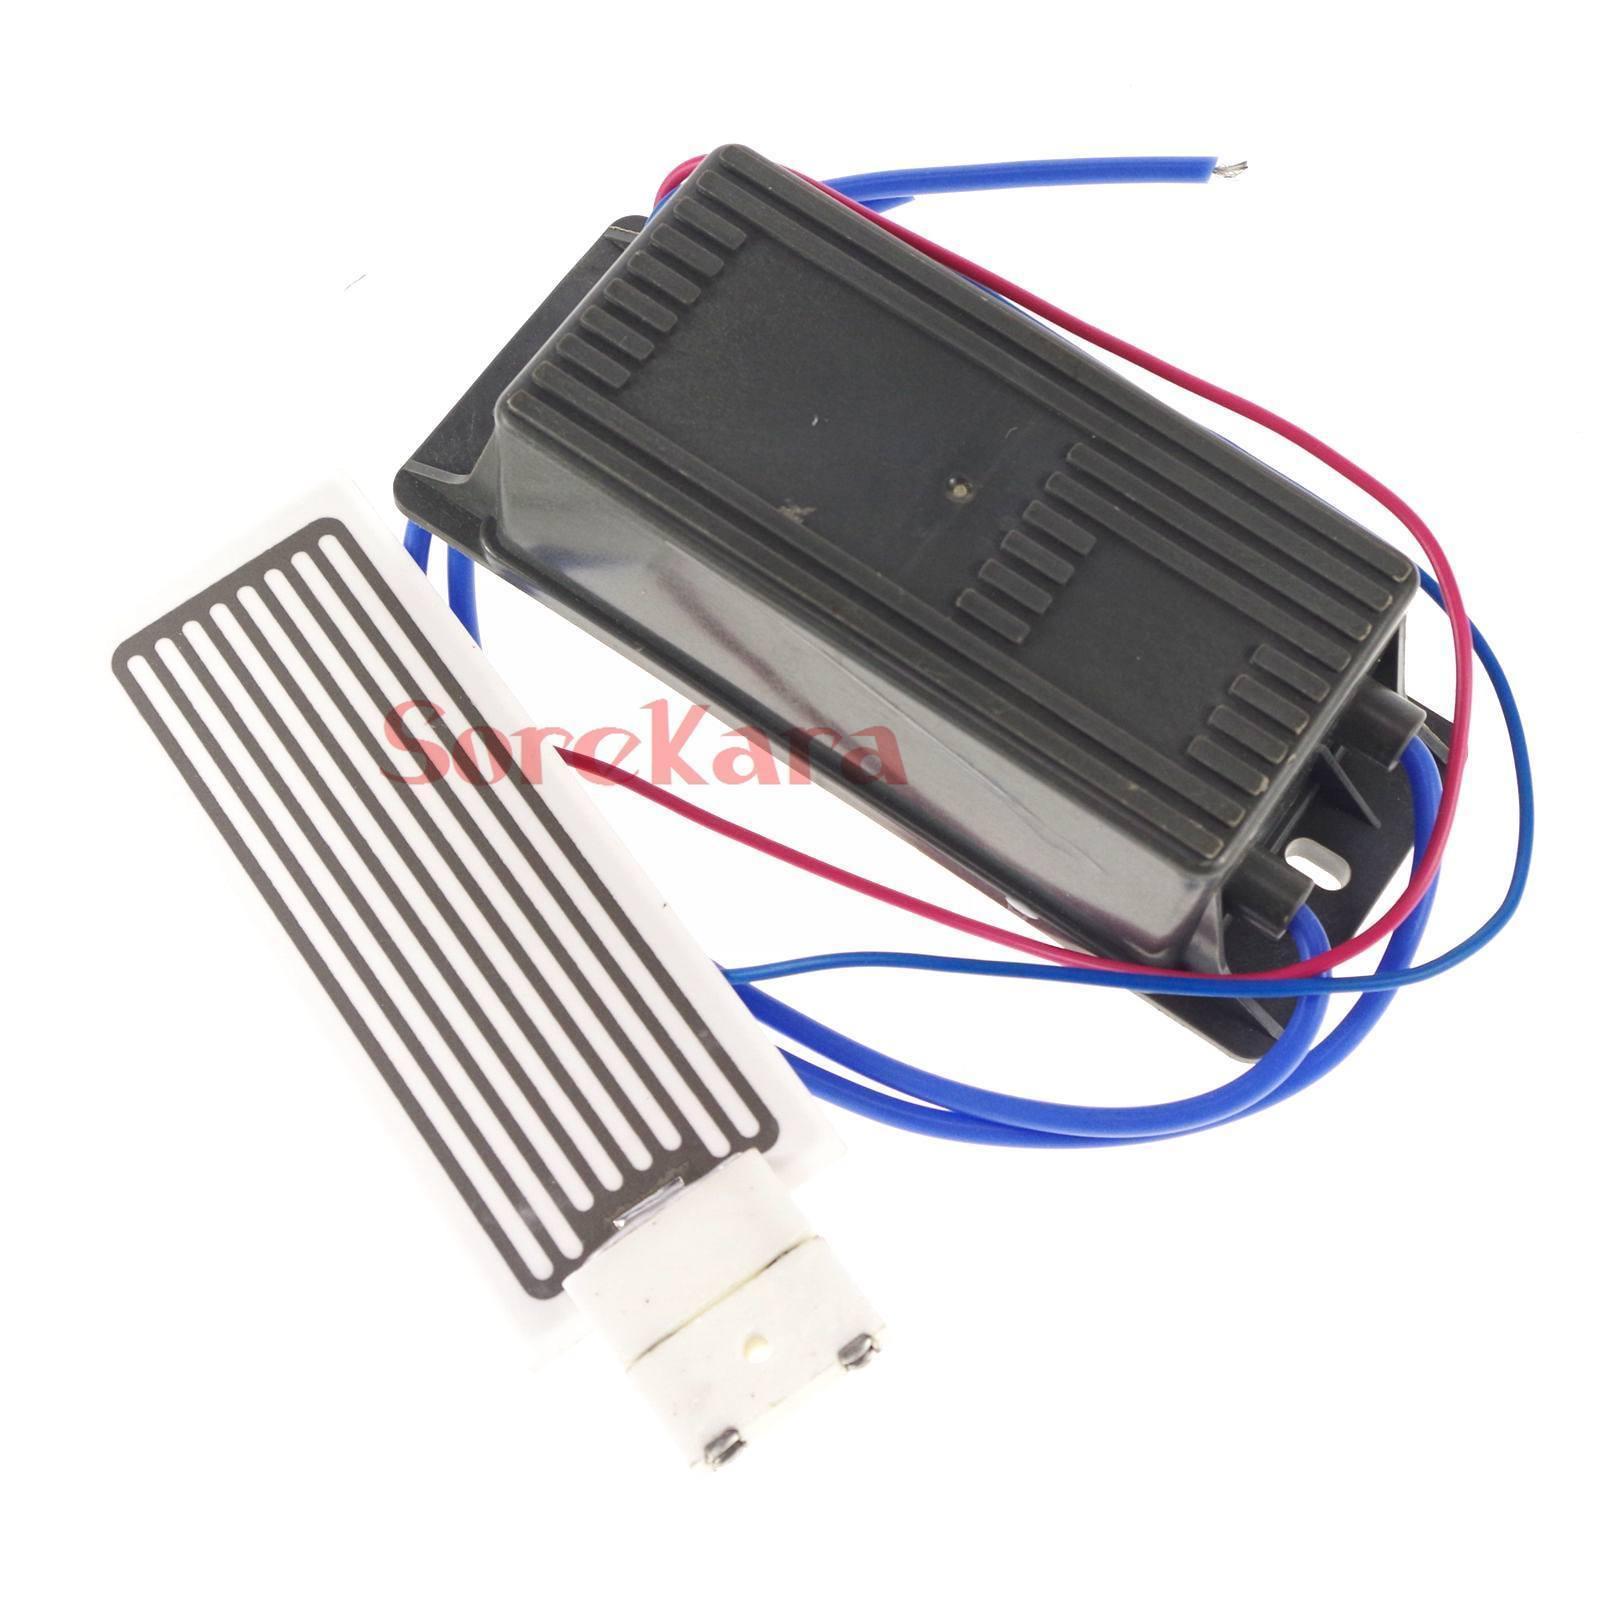 Output 5g/h 10g/h 12VDC 110VAC 220VAC Ceramic Plate Circuit Board Ozone Generator Air Purifier Kit 16KHZ Power + Plate